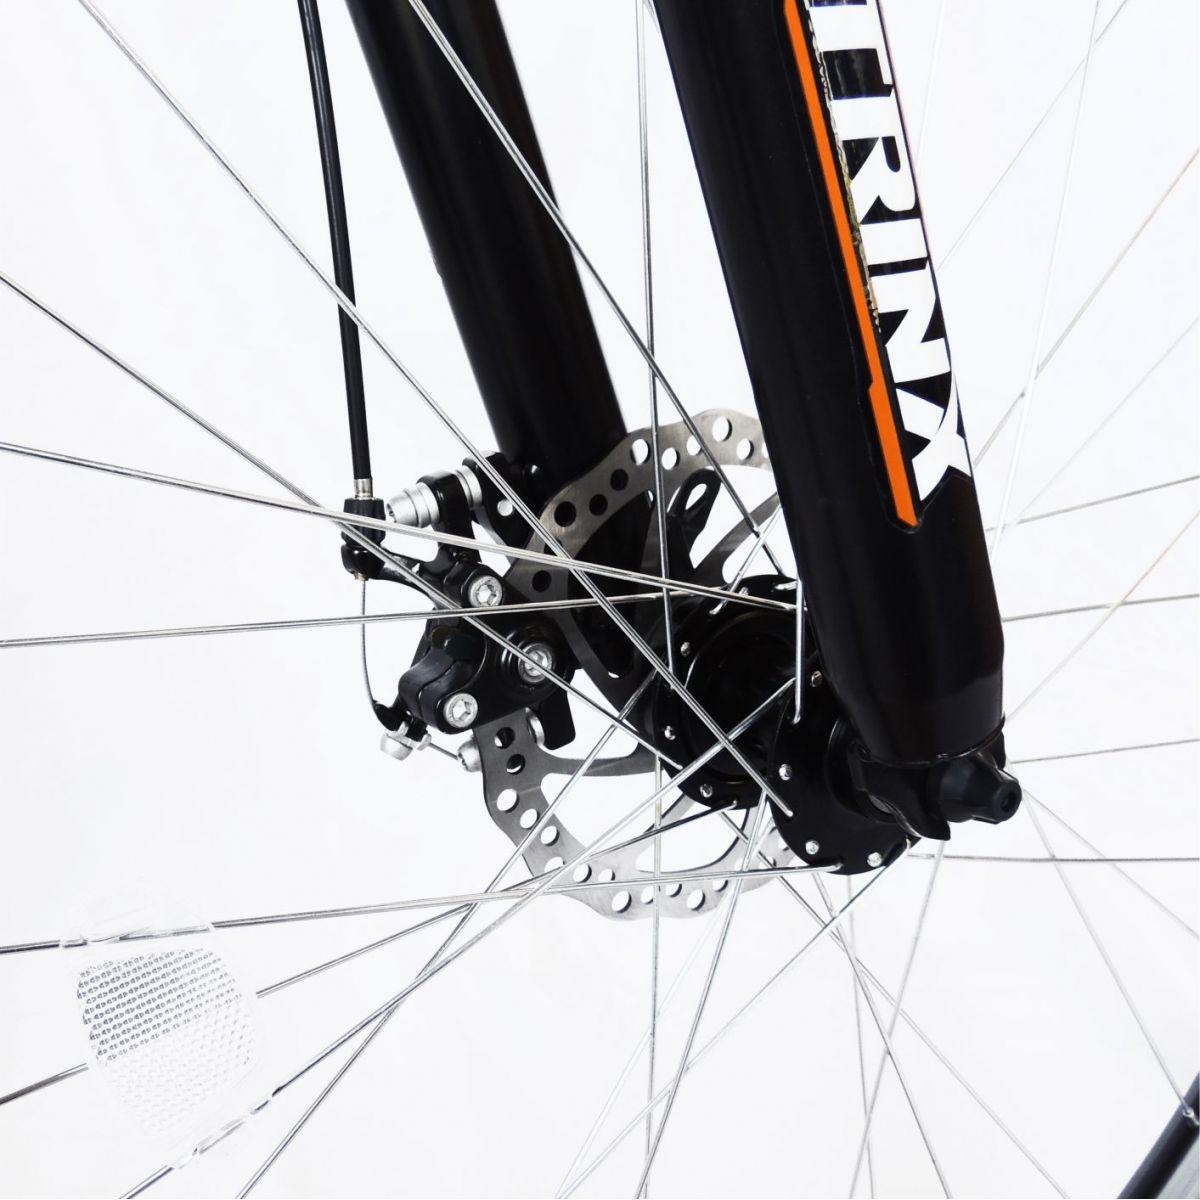 Bicicleta Trinx STI 2.0 Aro 29 Freio/DISC Susp 24V Kit Shimano Preto com Laranja